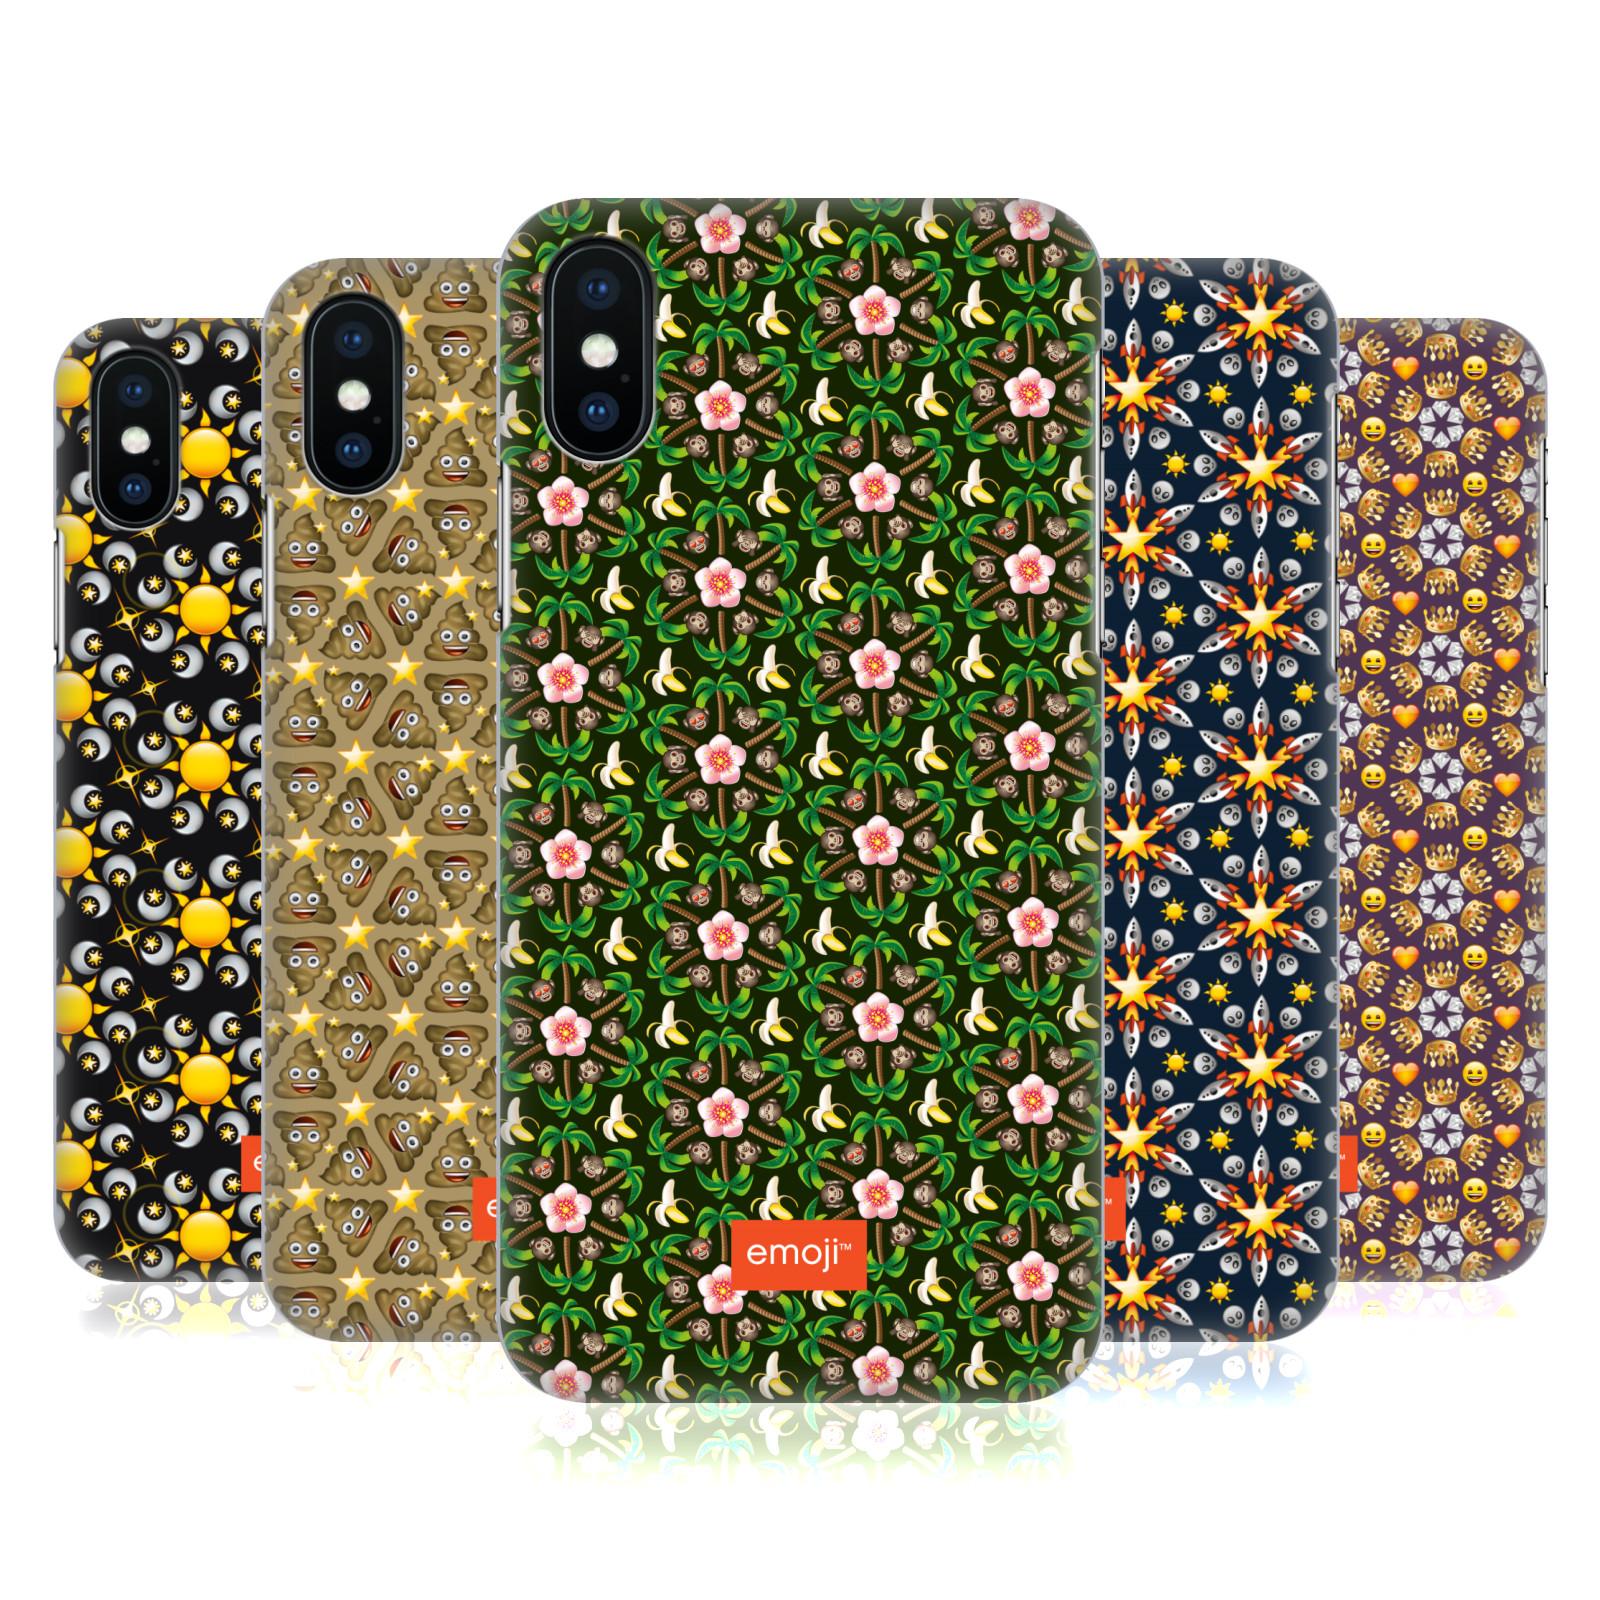 Emoji Floral Patterns